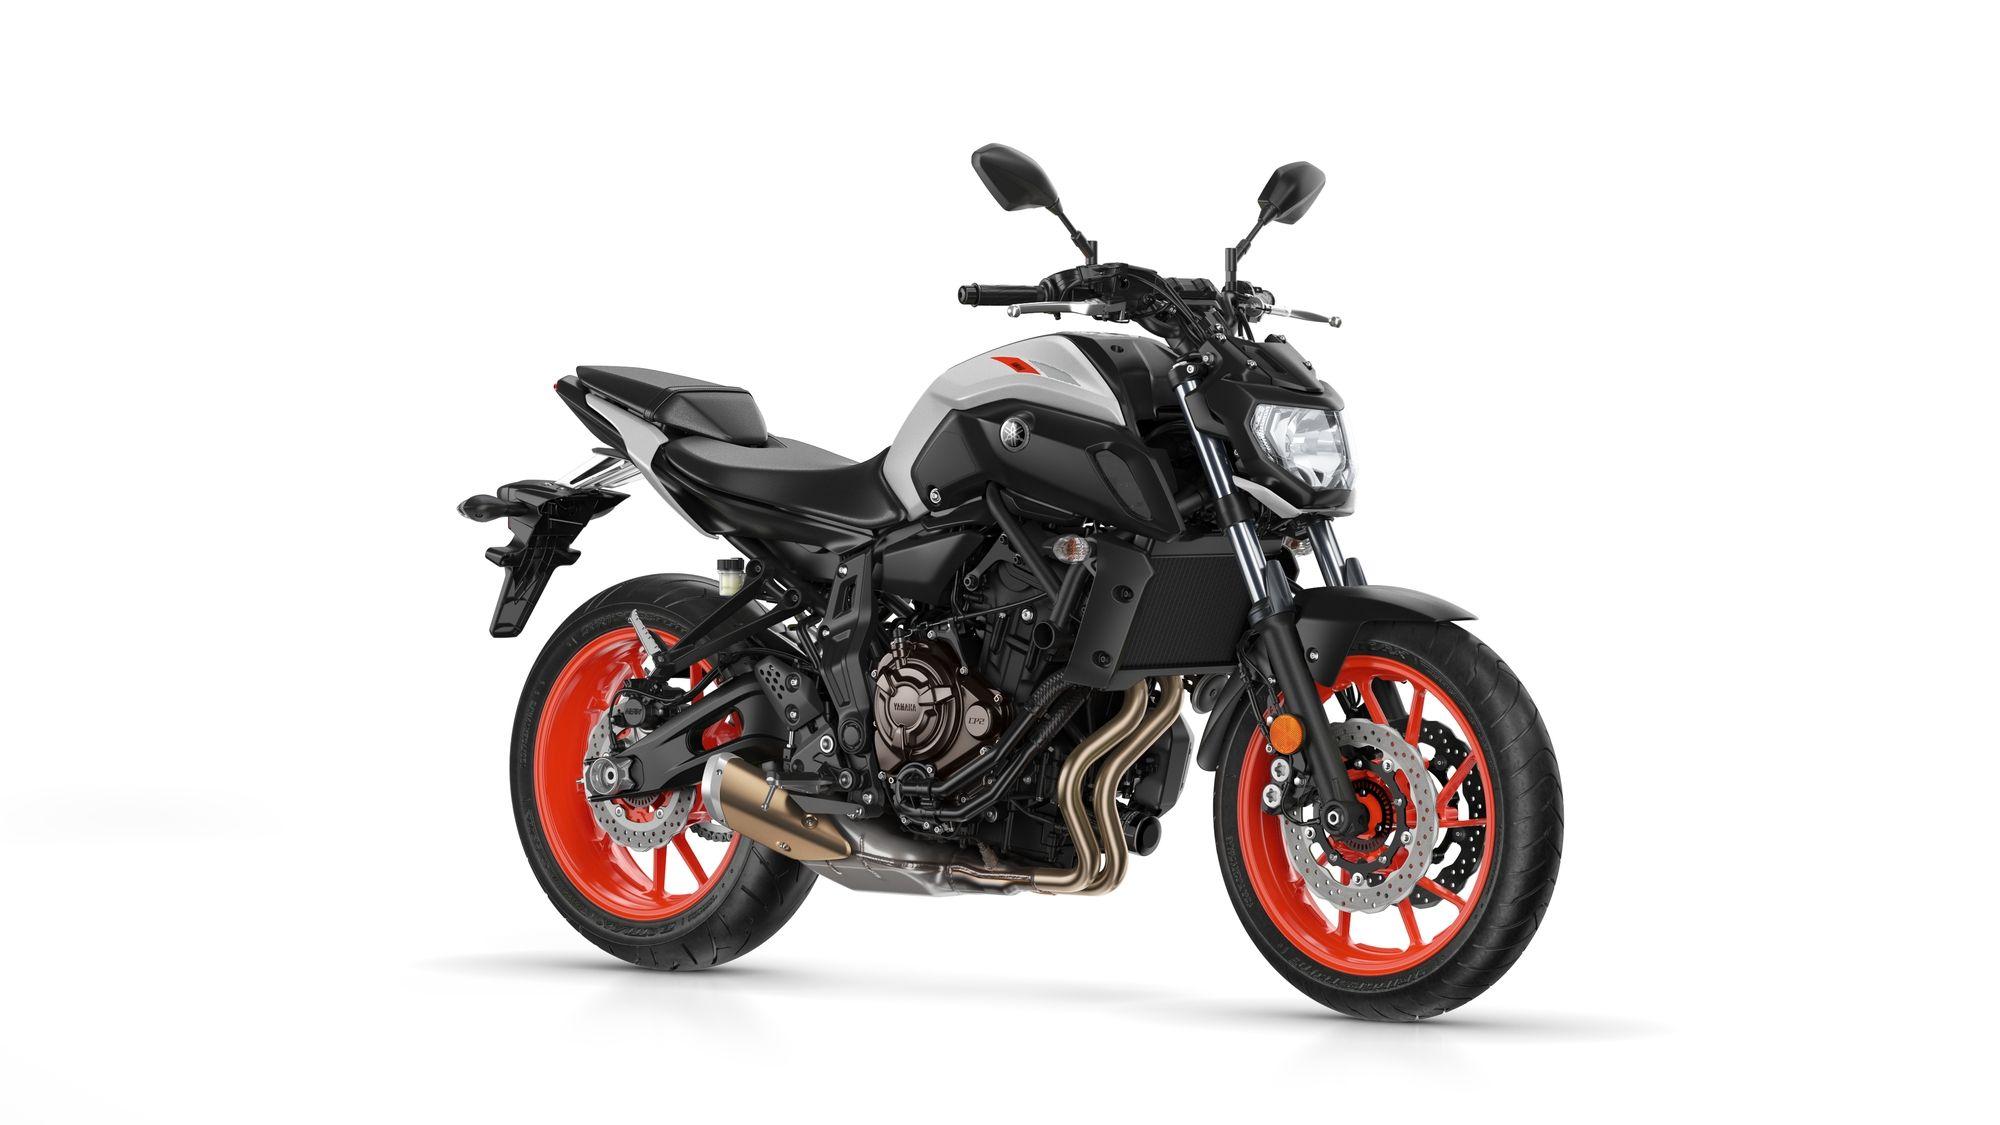 Yamaha Mt 07 Google Search Yamaha Mt07 Yamaha Motor Motorcycle